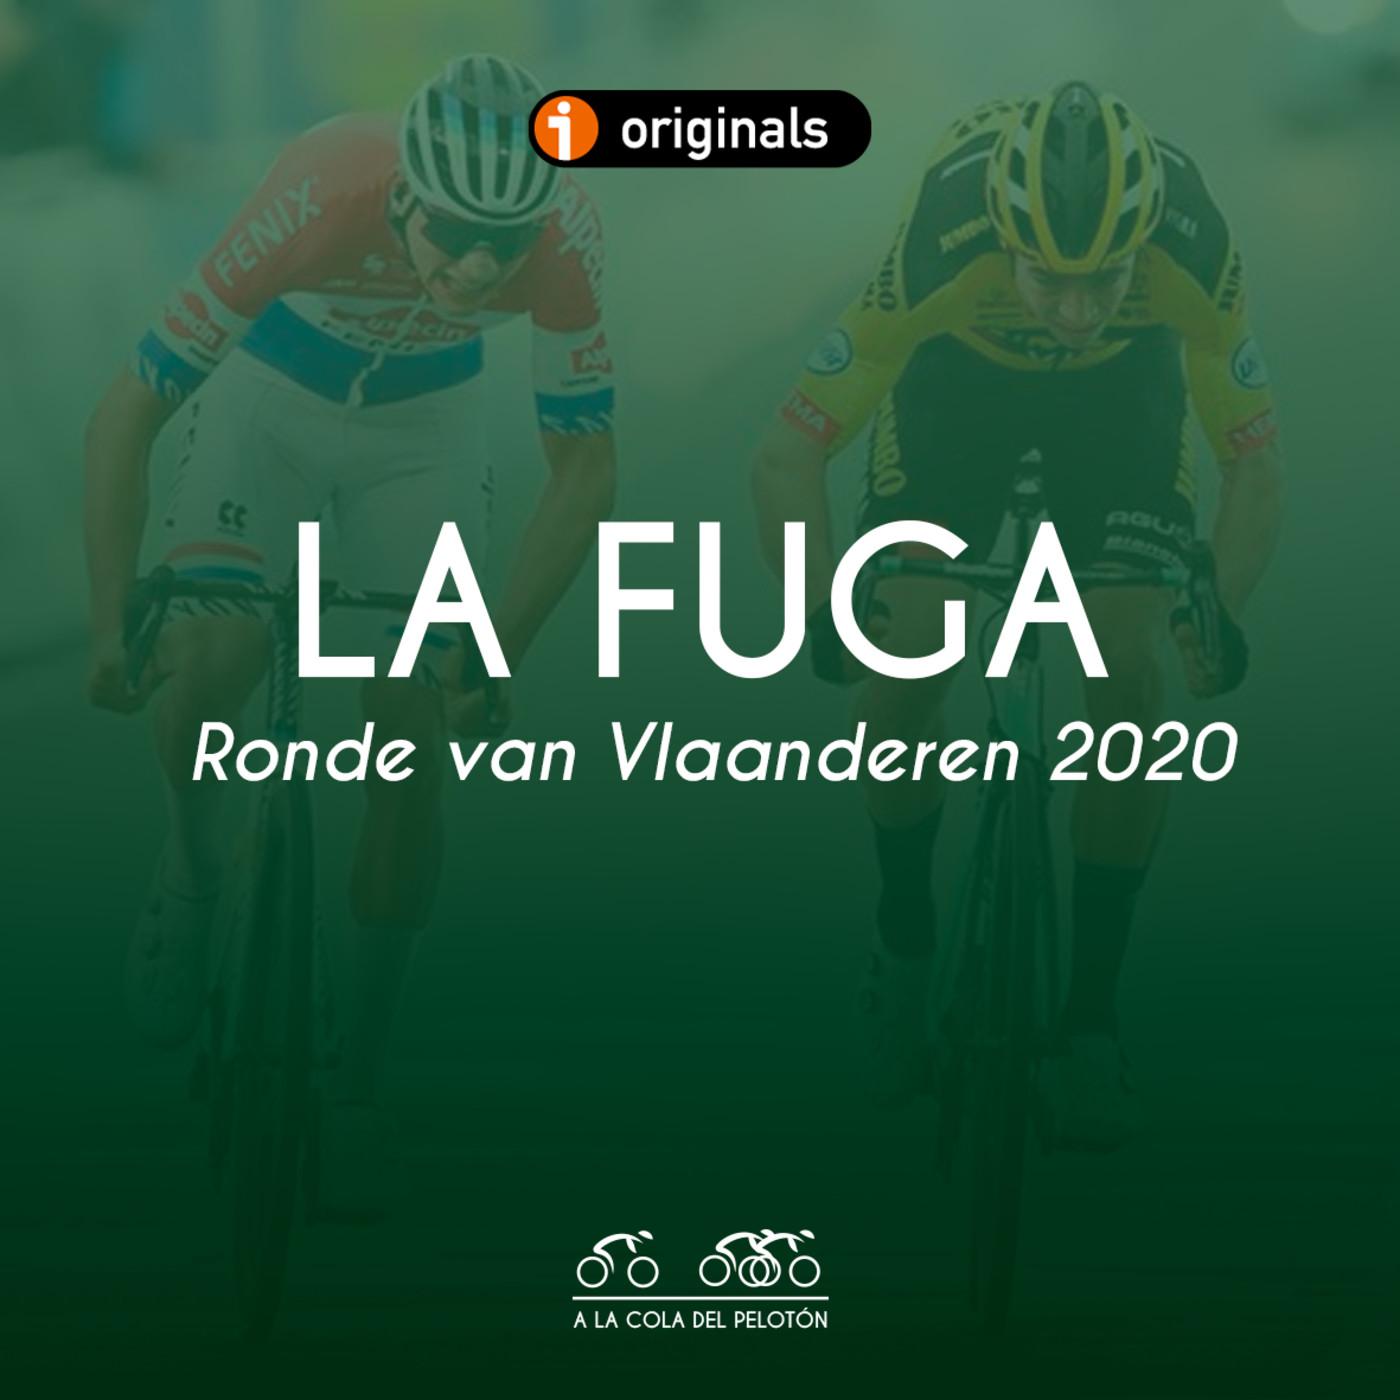 Análisis de Ronde van Vlaanderen 2020 | La Fuga